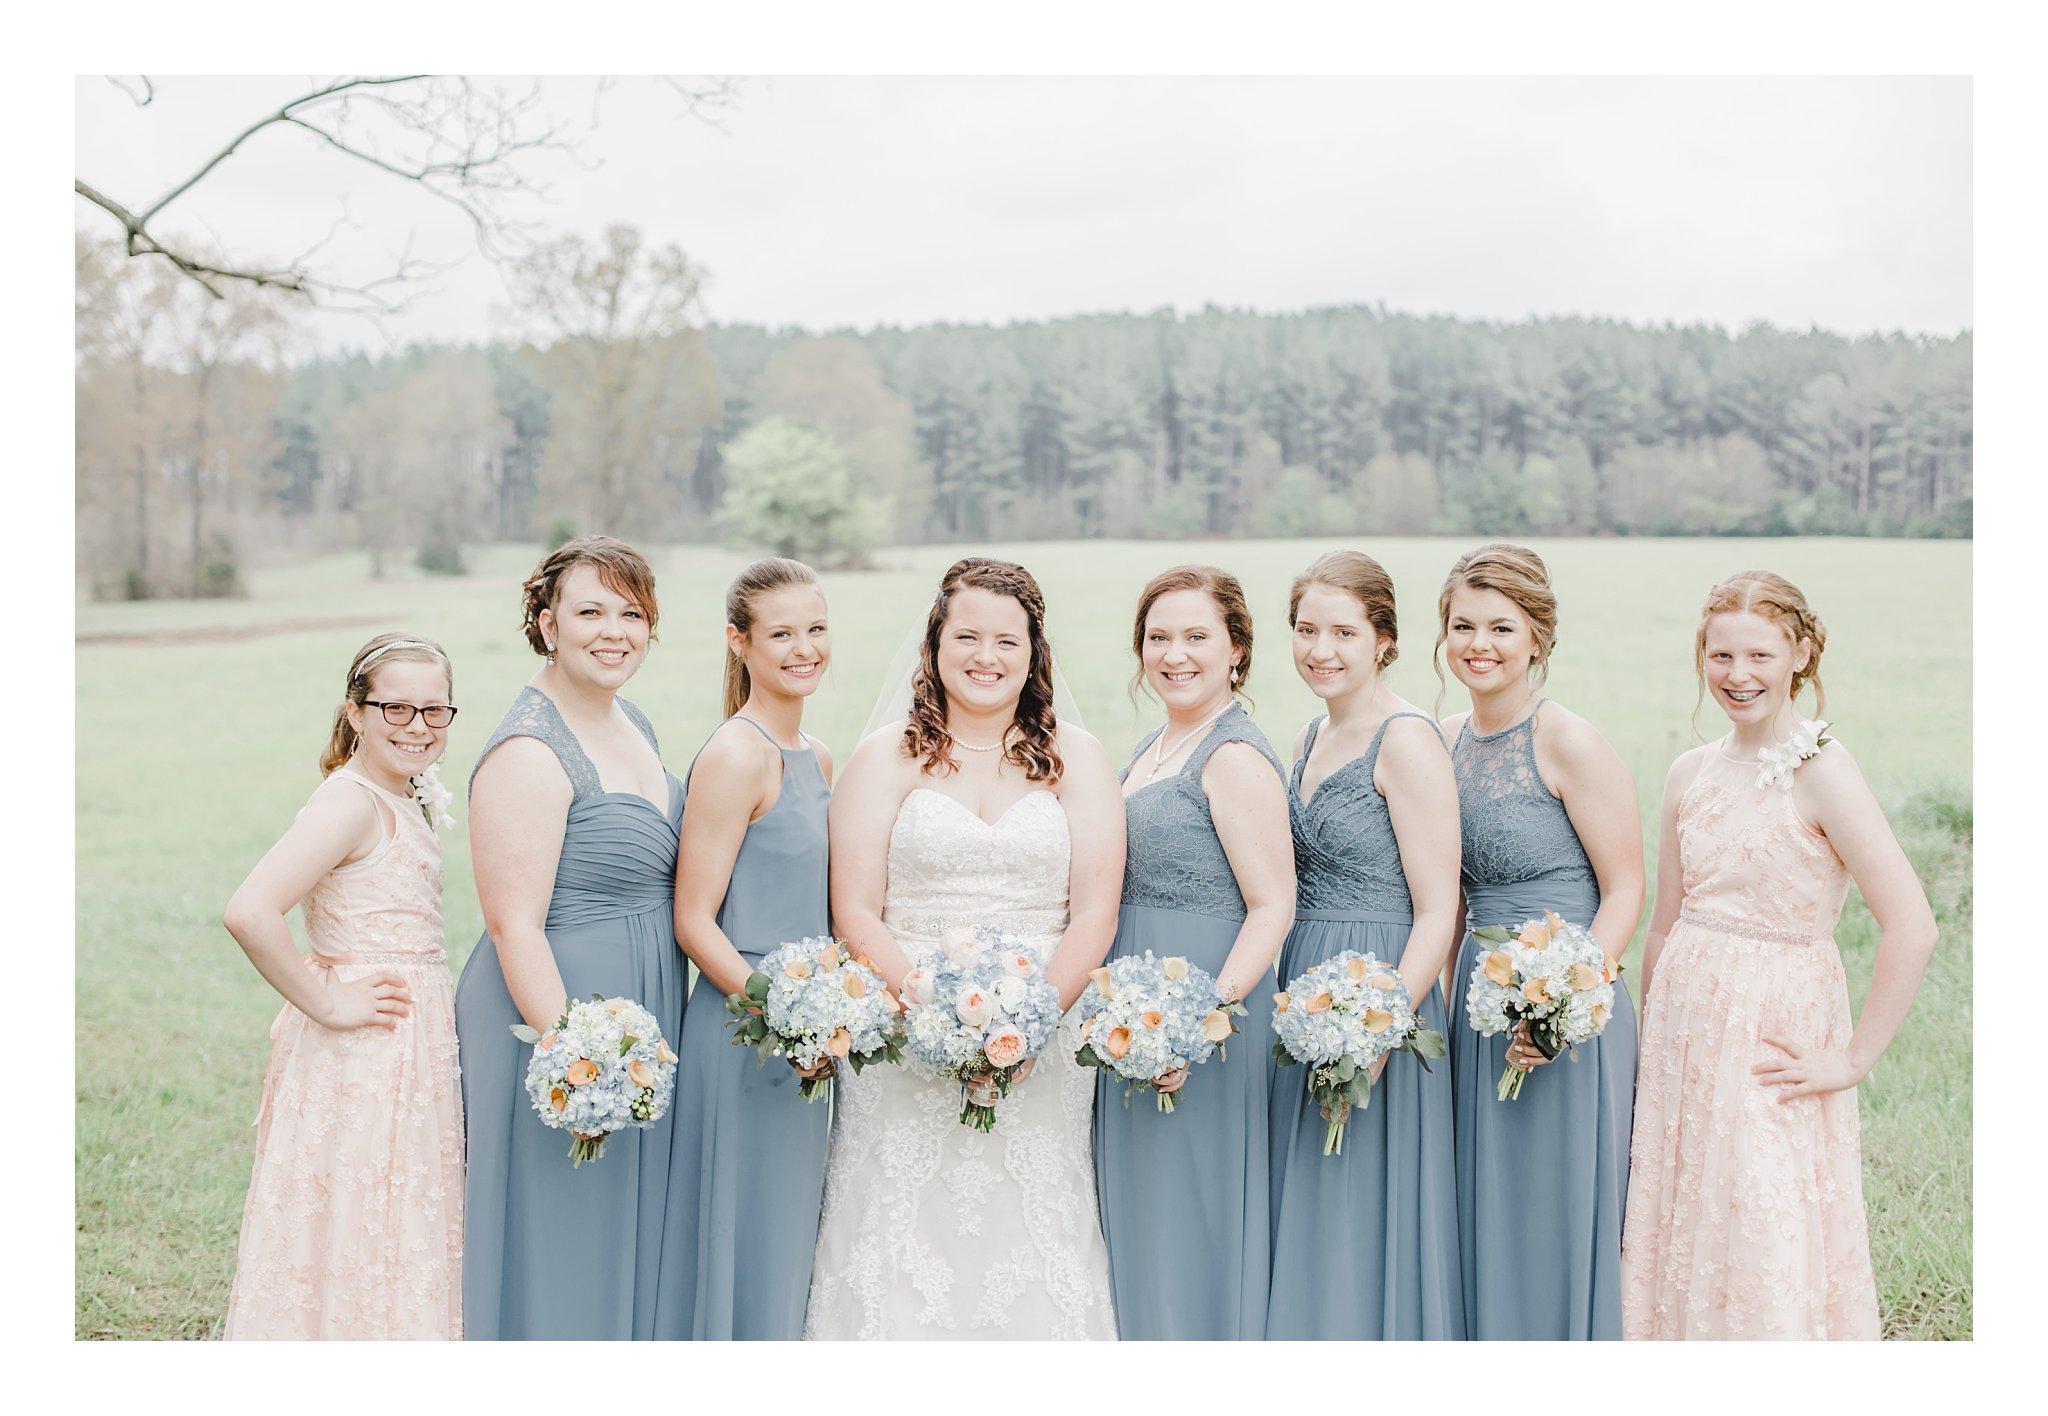 steel-blue-blush-spring-lace-gown-newberry-sc-wedding-photos-_0032.jpg